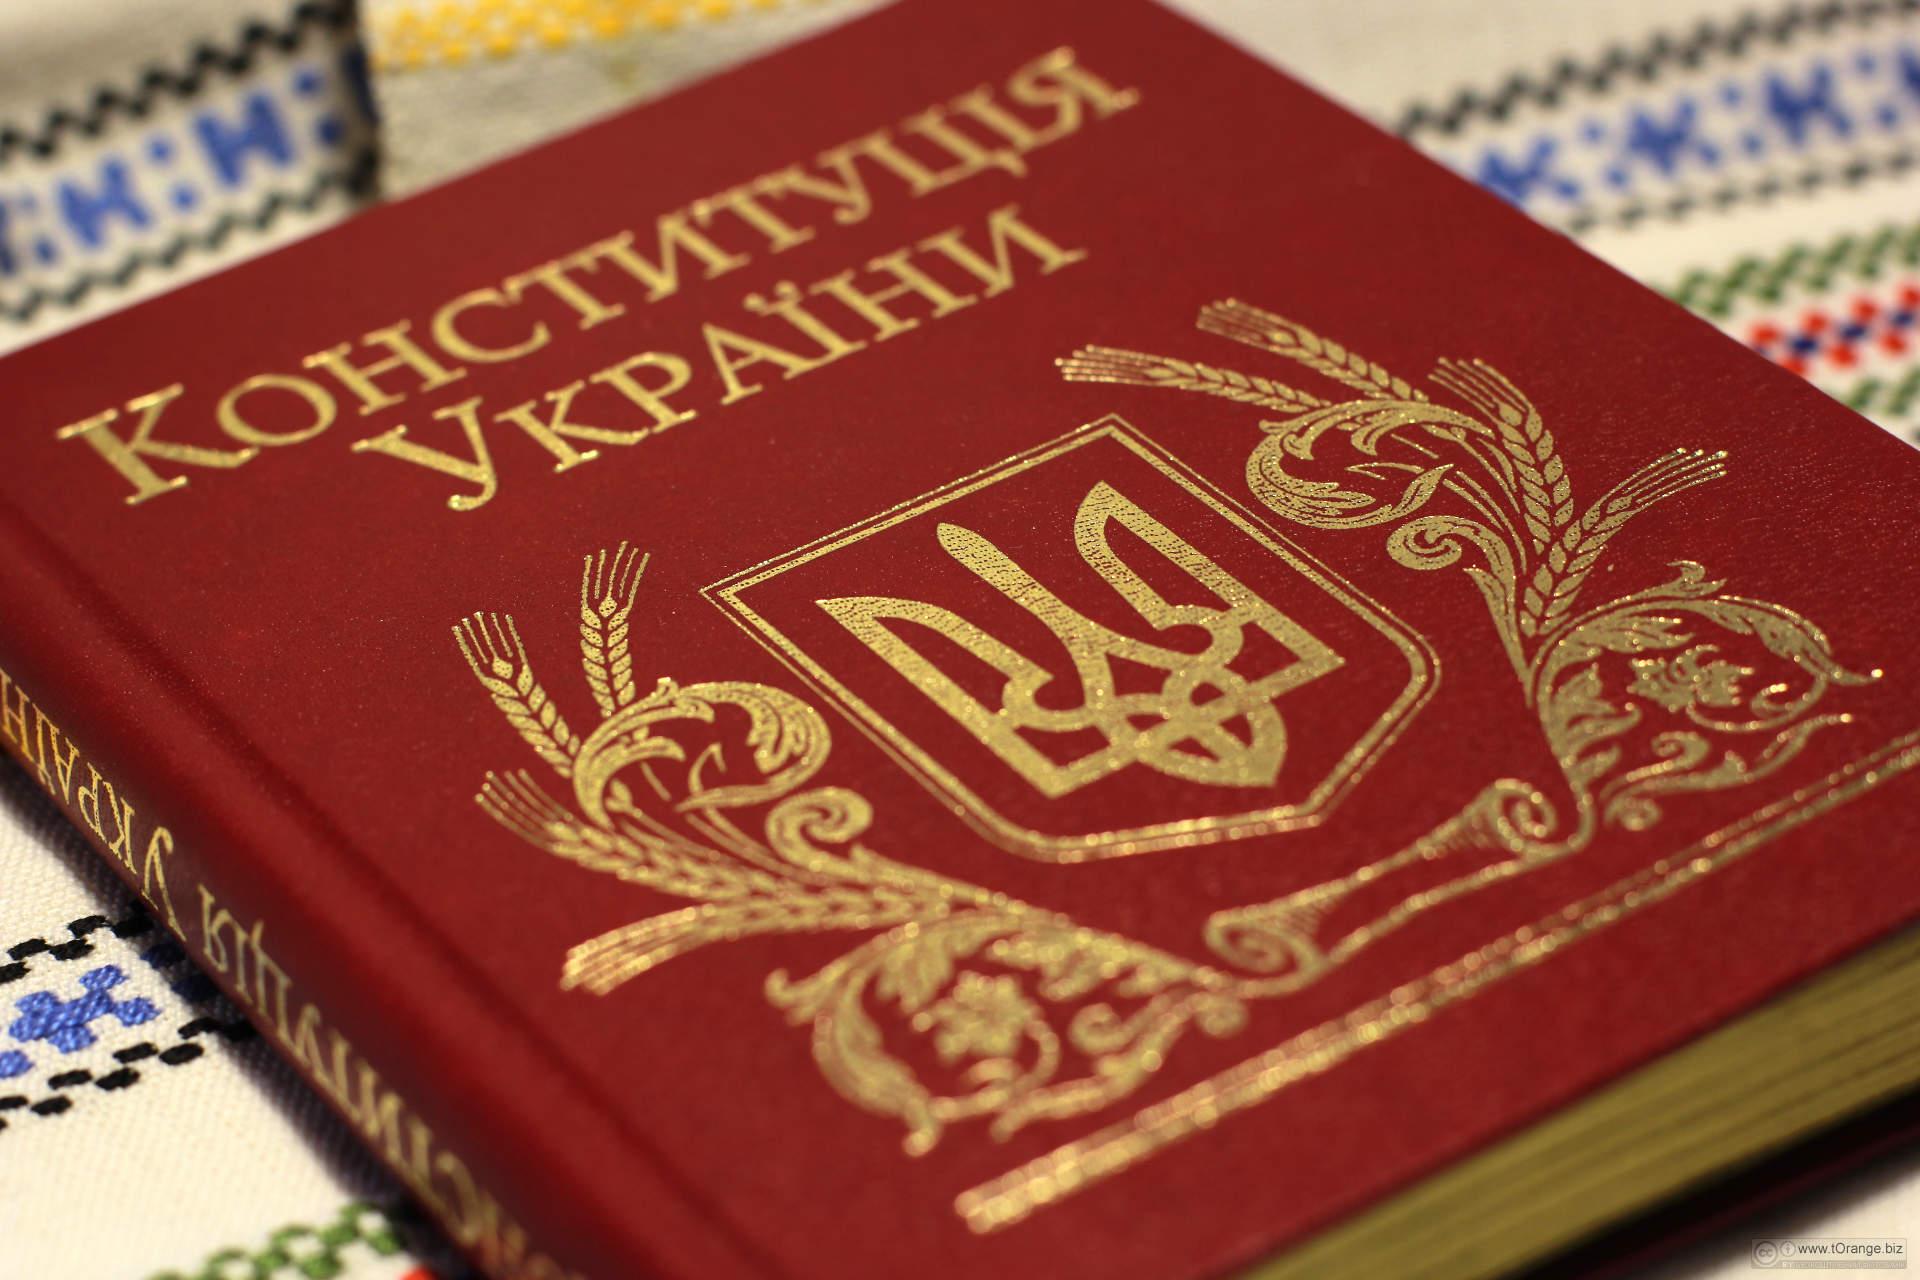 https://upload.wikimedia.org/wikipedia/commons/8/85/Constitution_of_Ukraine.jpg